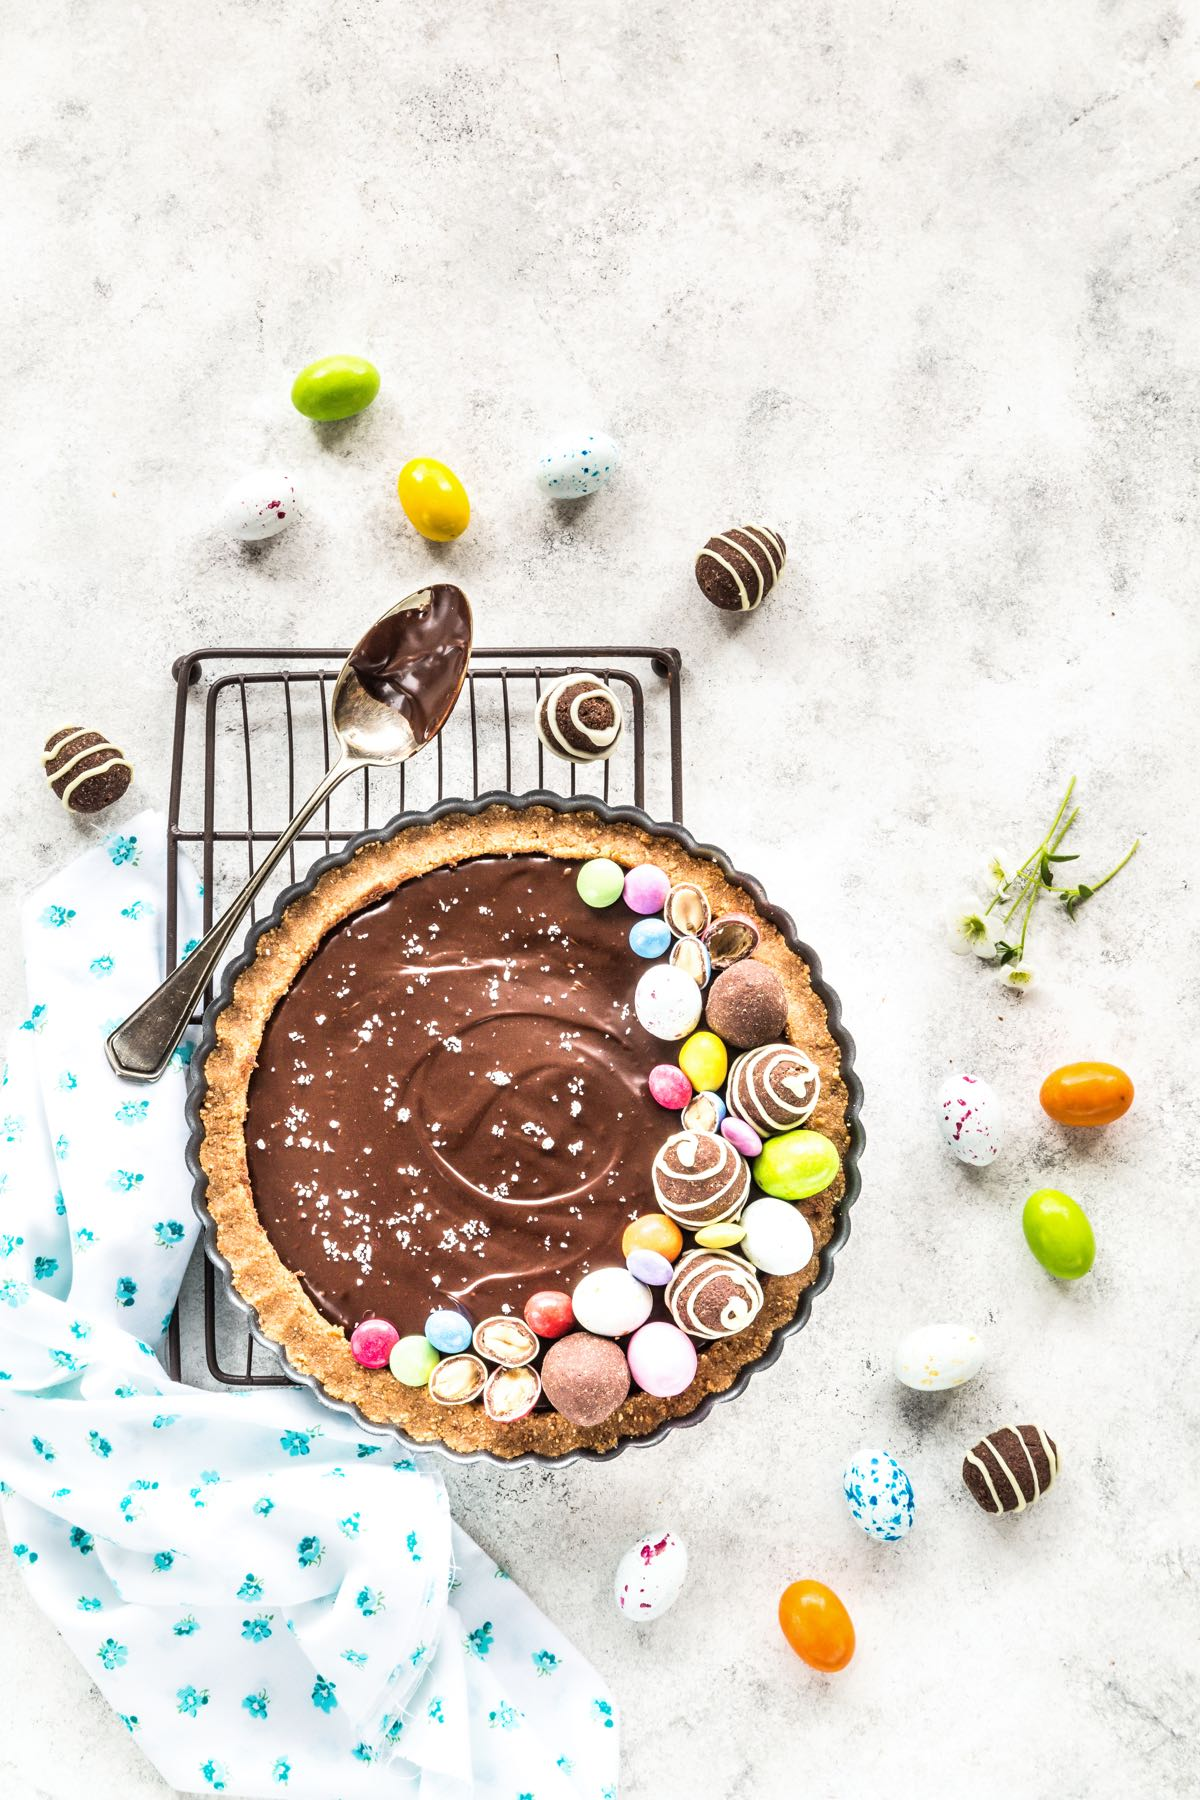 TART AL CIOCCOLATO E CARAMELLO SALATO - CHOCOLATE SALTED CARAMEL TART RECIPE - FOOD PHOTOGRAPHY - FOOD STYLING - SONIA MONAGHEDDU - OPSD BLOG